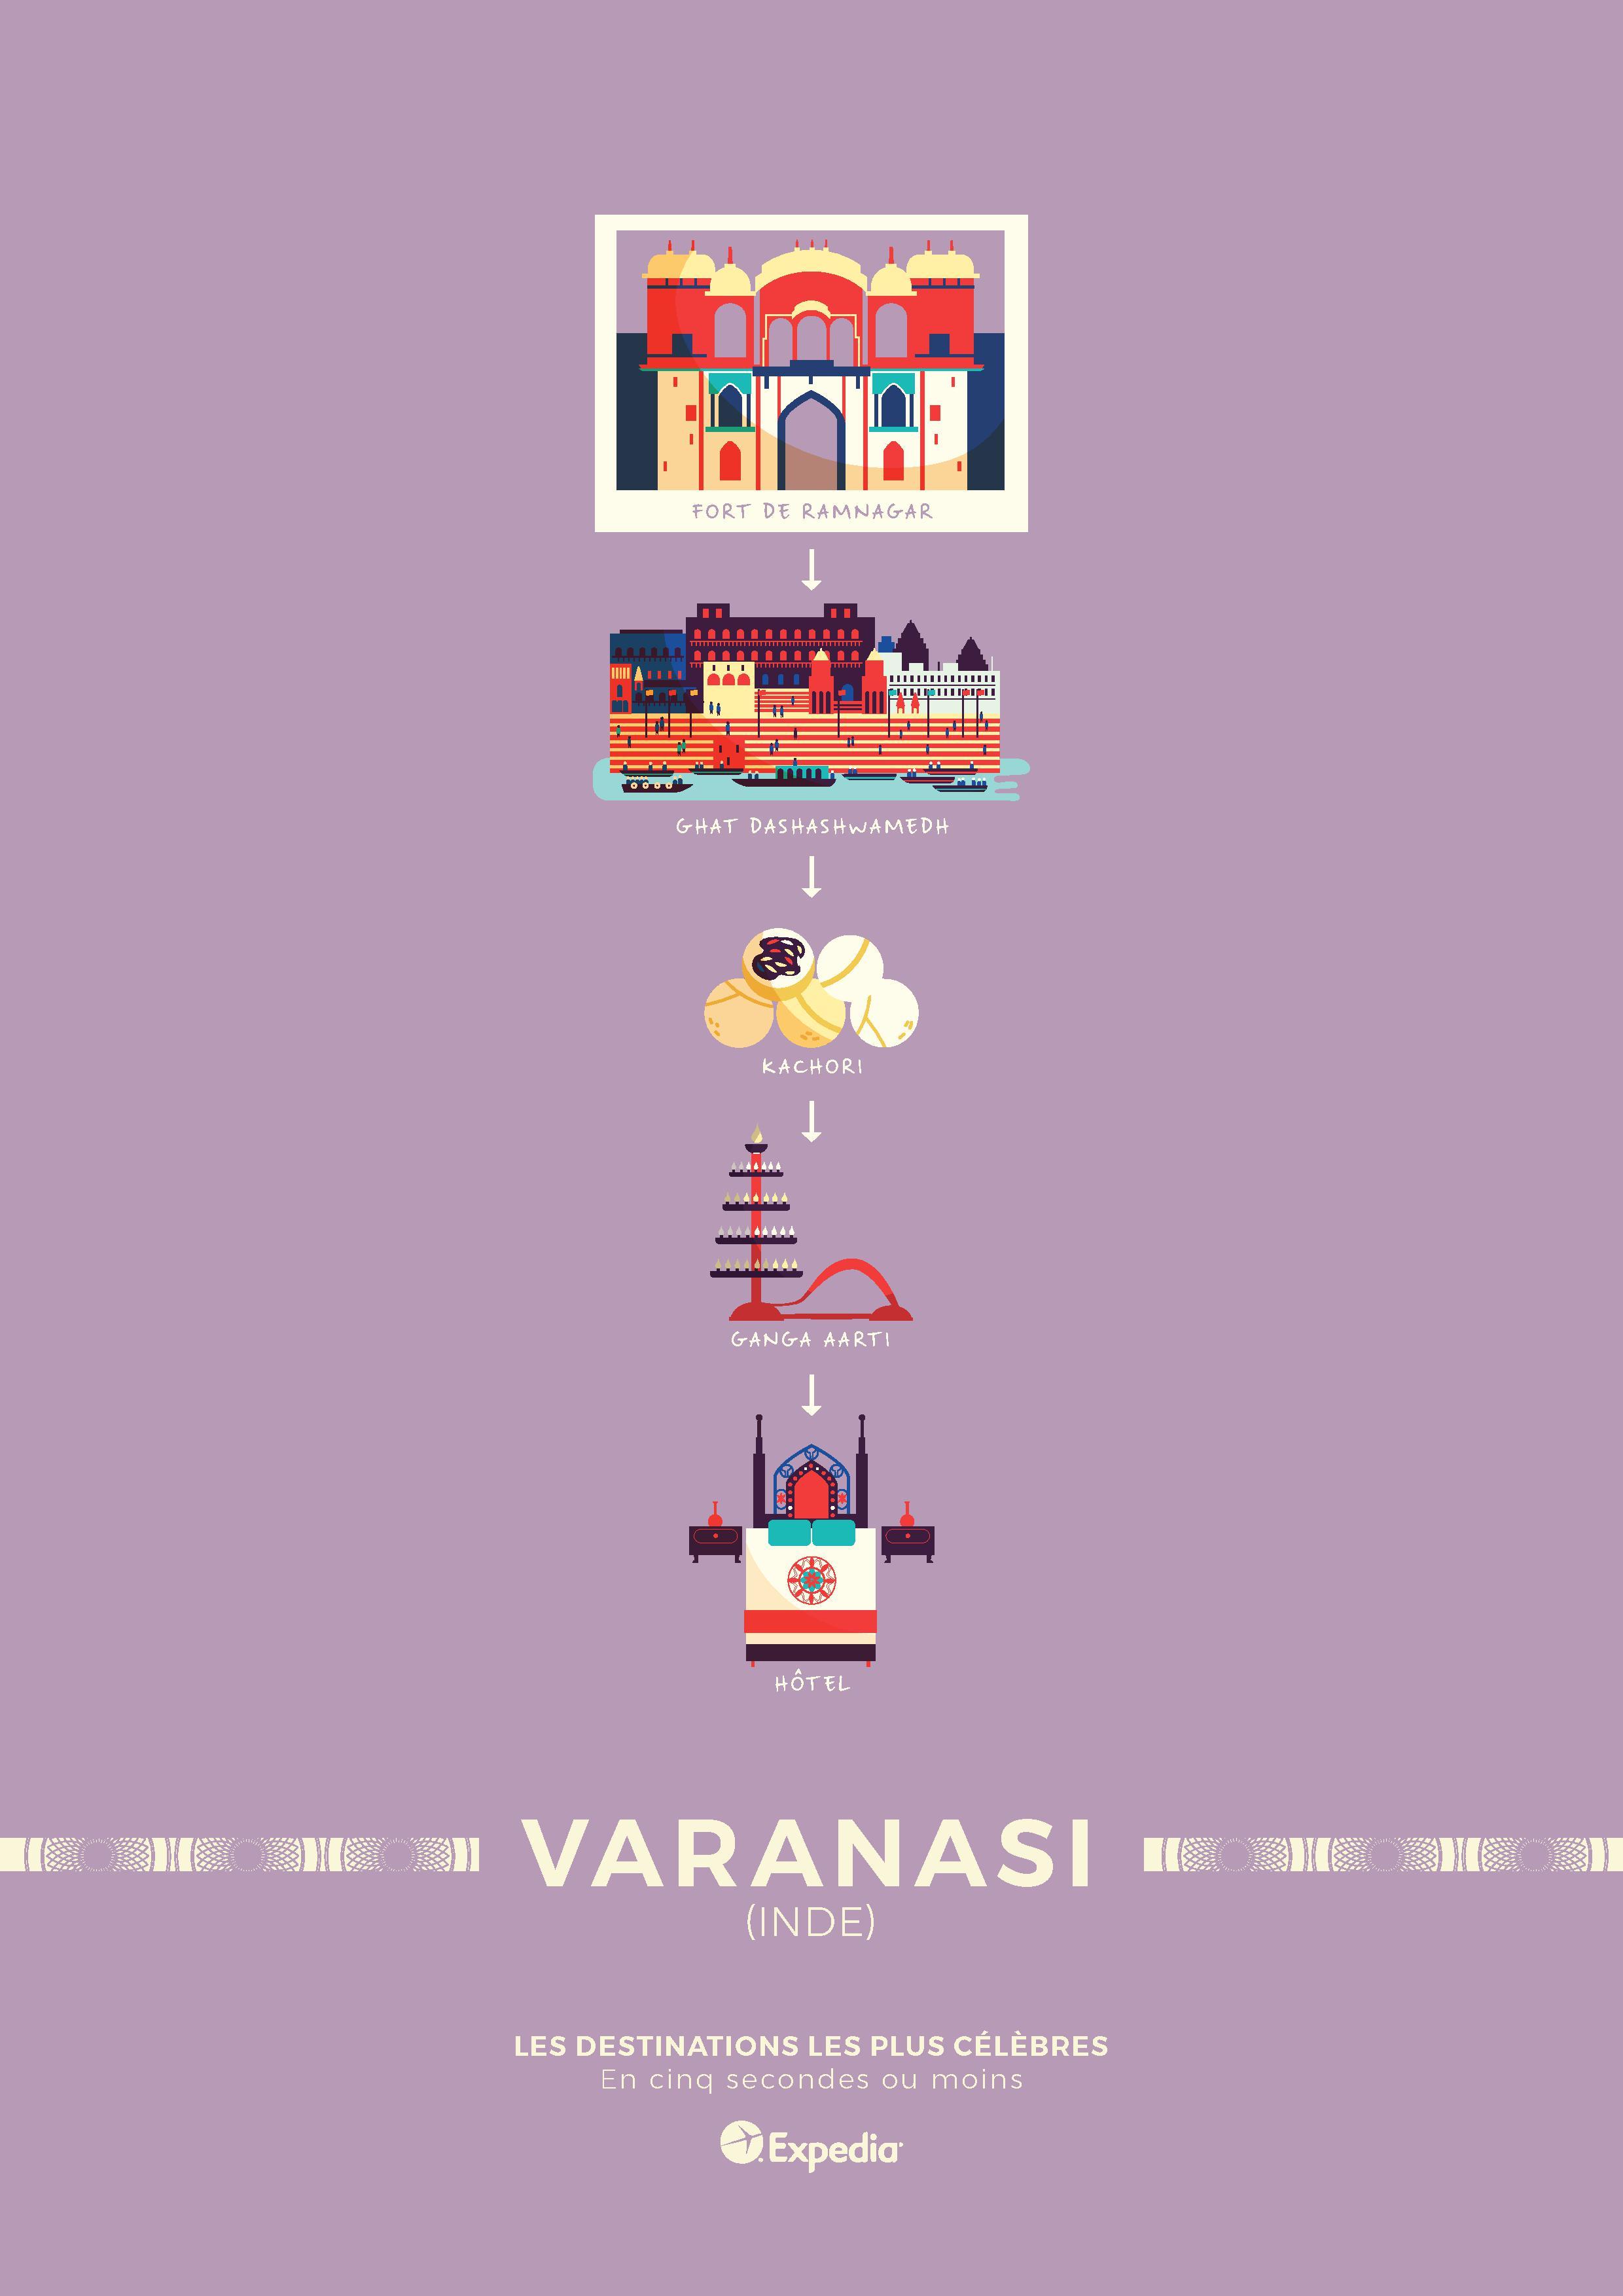 Poster-voyage-Varanasi.jpg?1542813910